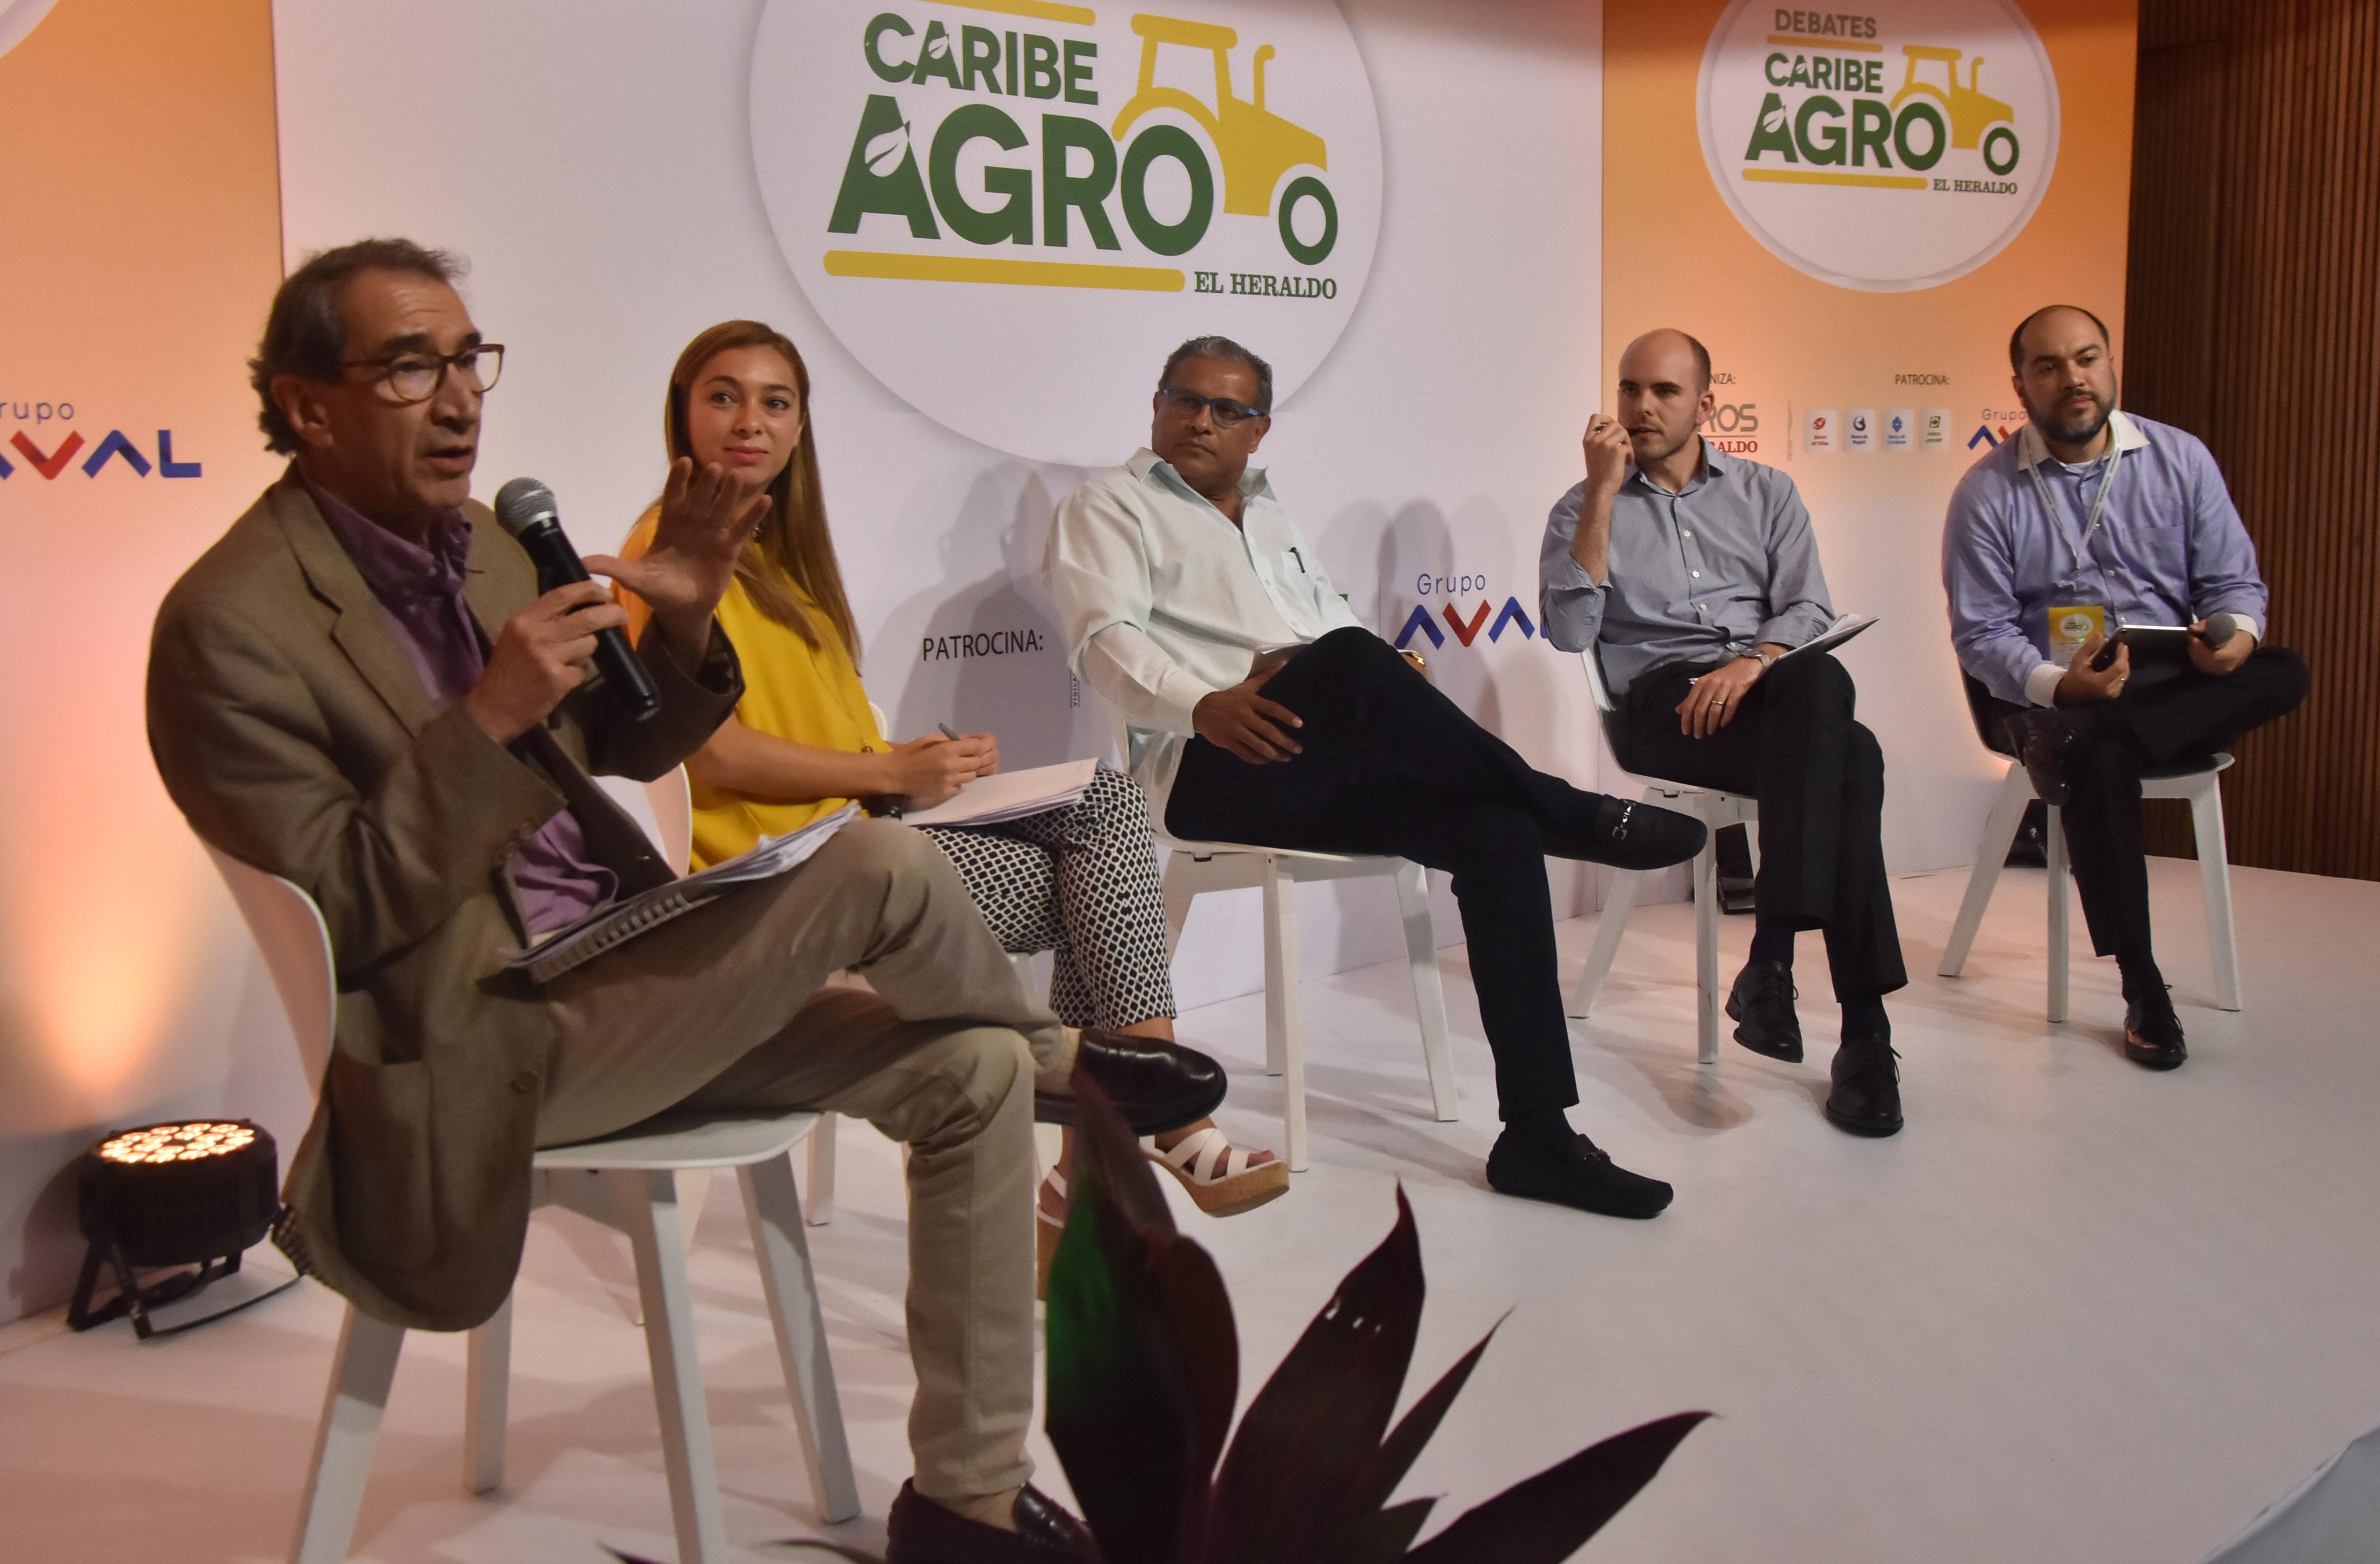 Aurelio Suárez, Paula Zuleta, Óscar Montes, Rafael Puyana y John Olivares participaron en otro panel.